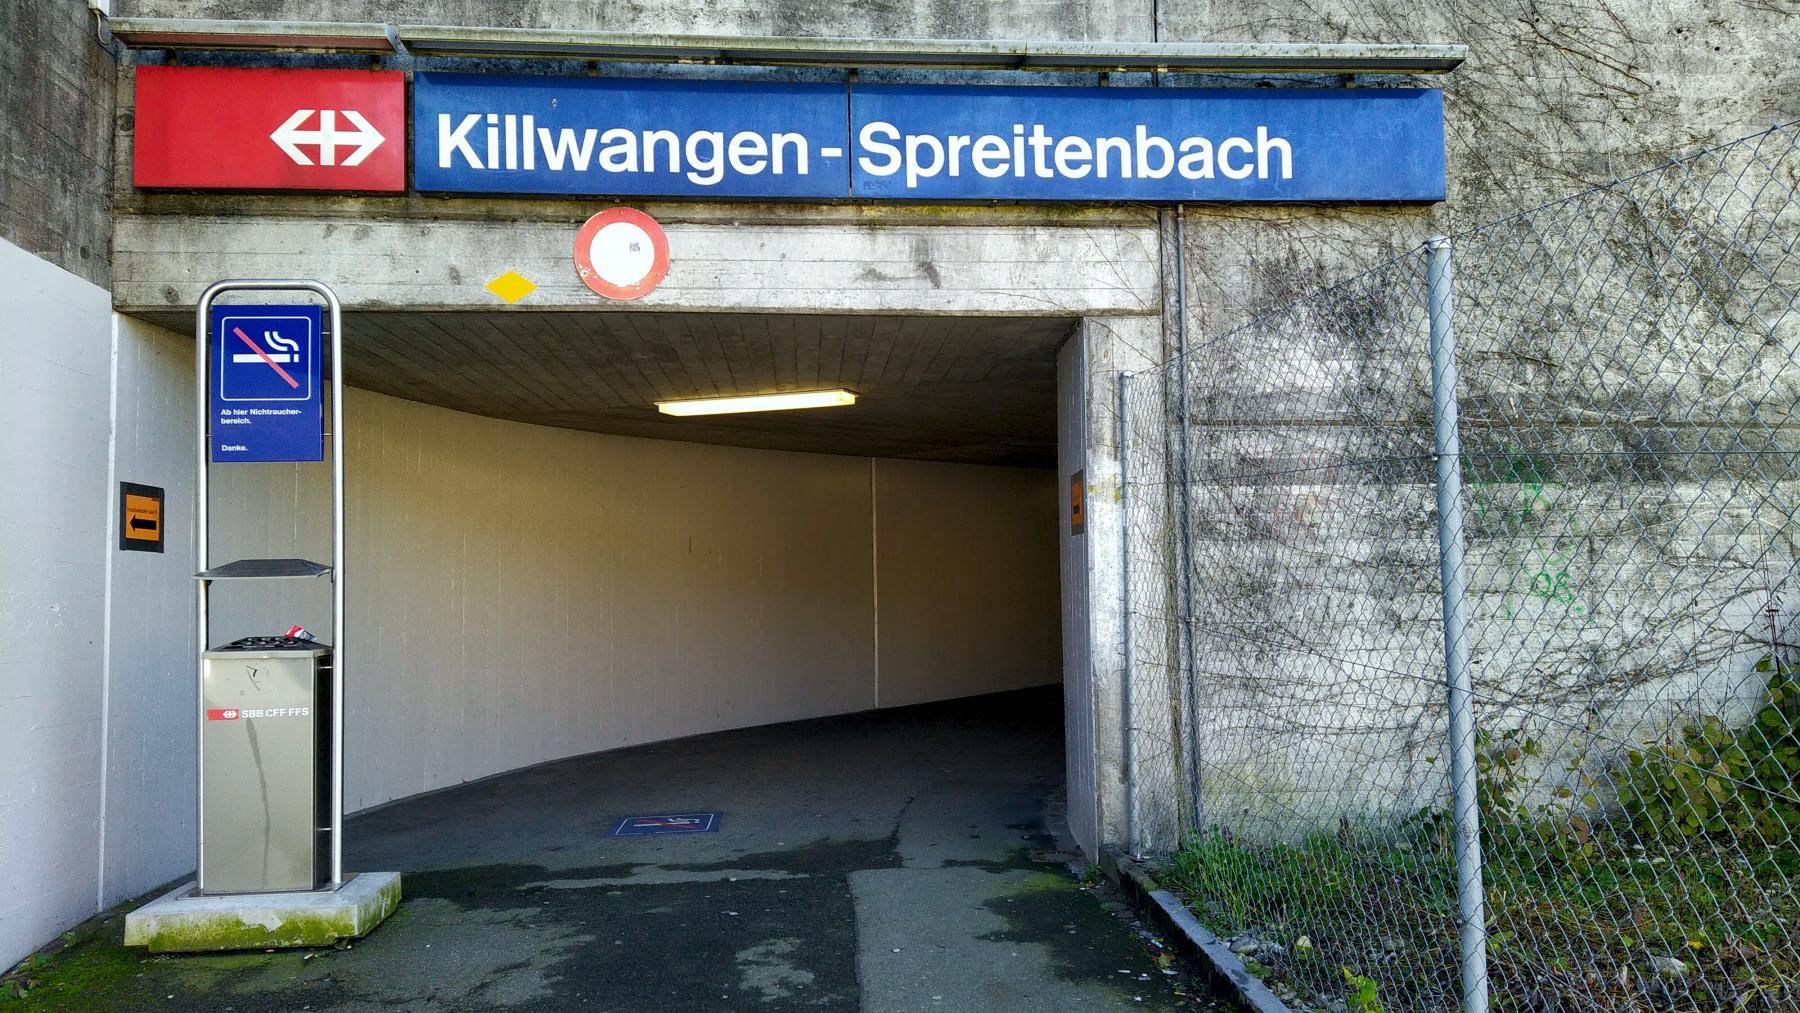 21 Killwangen-Spreitenbach SBB